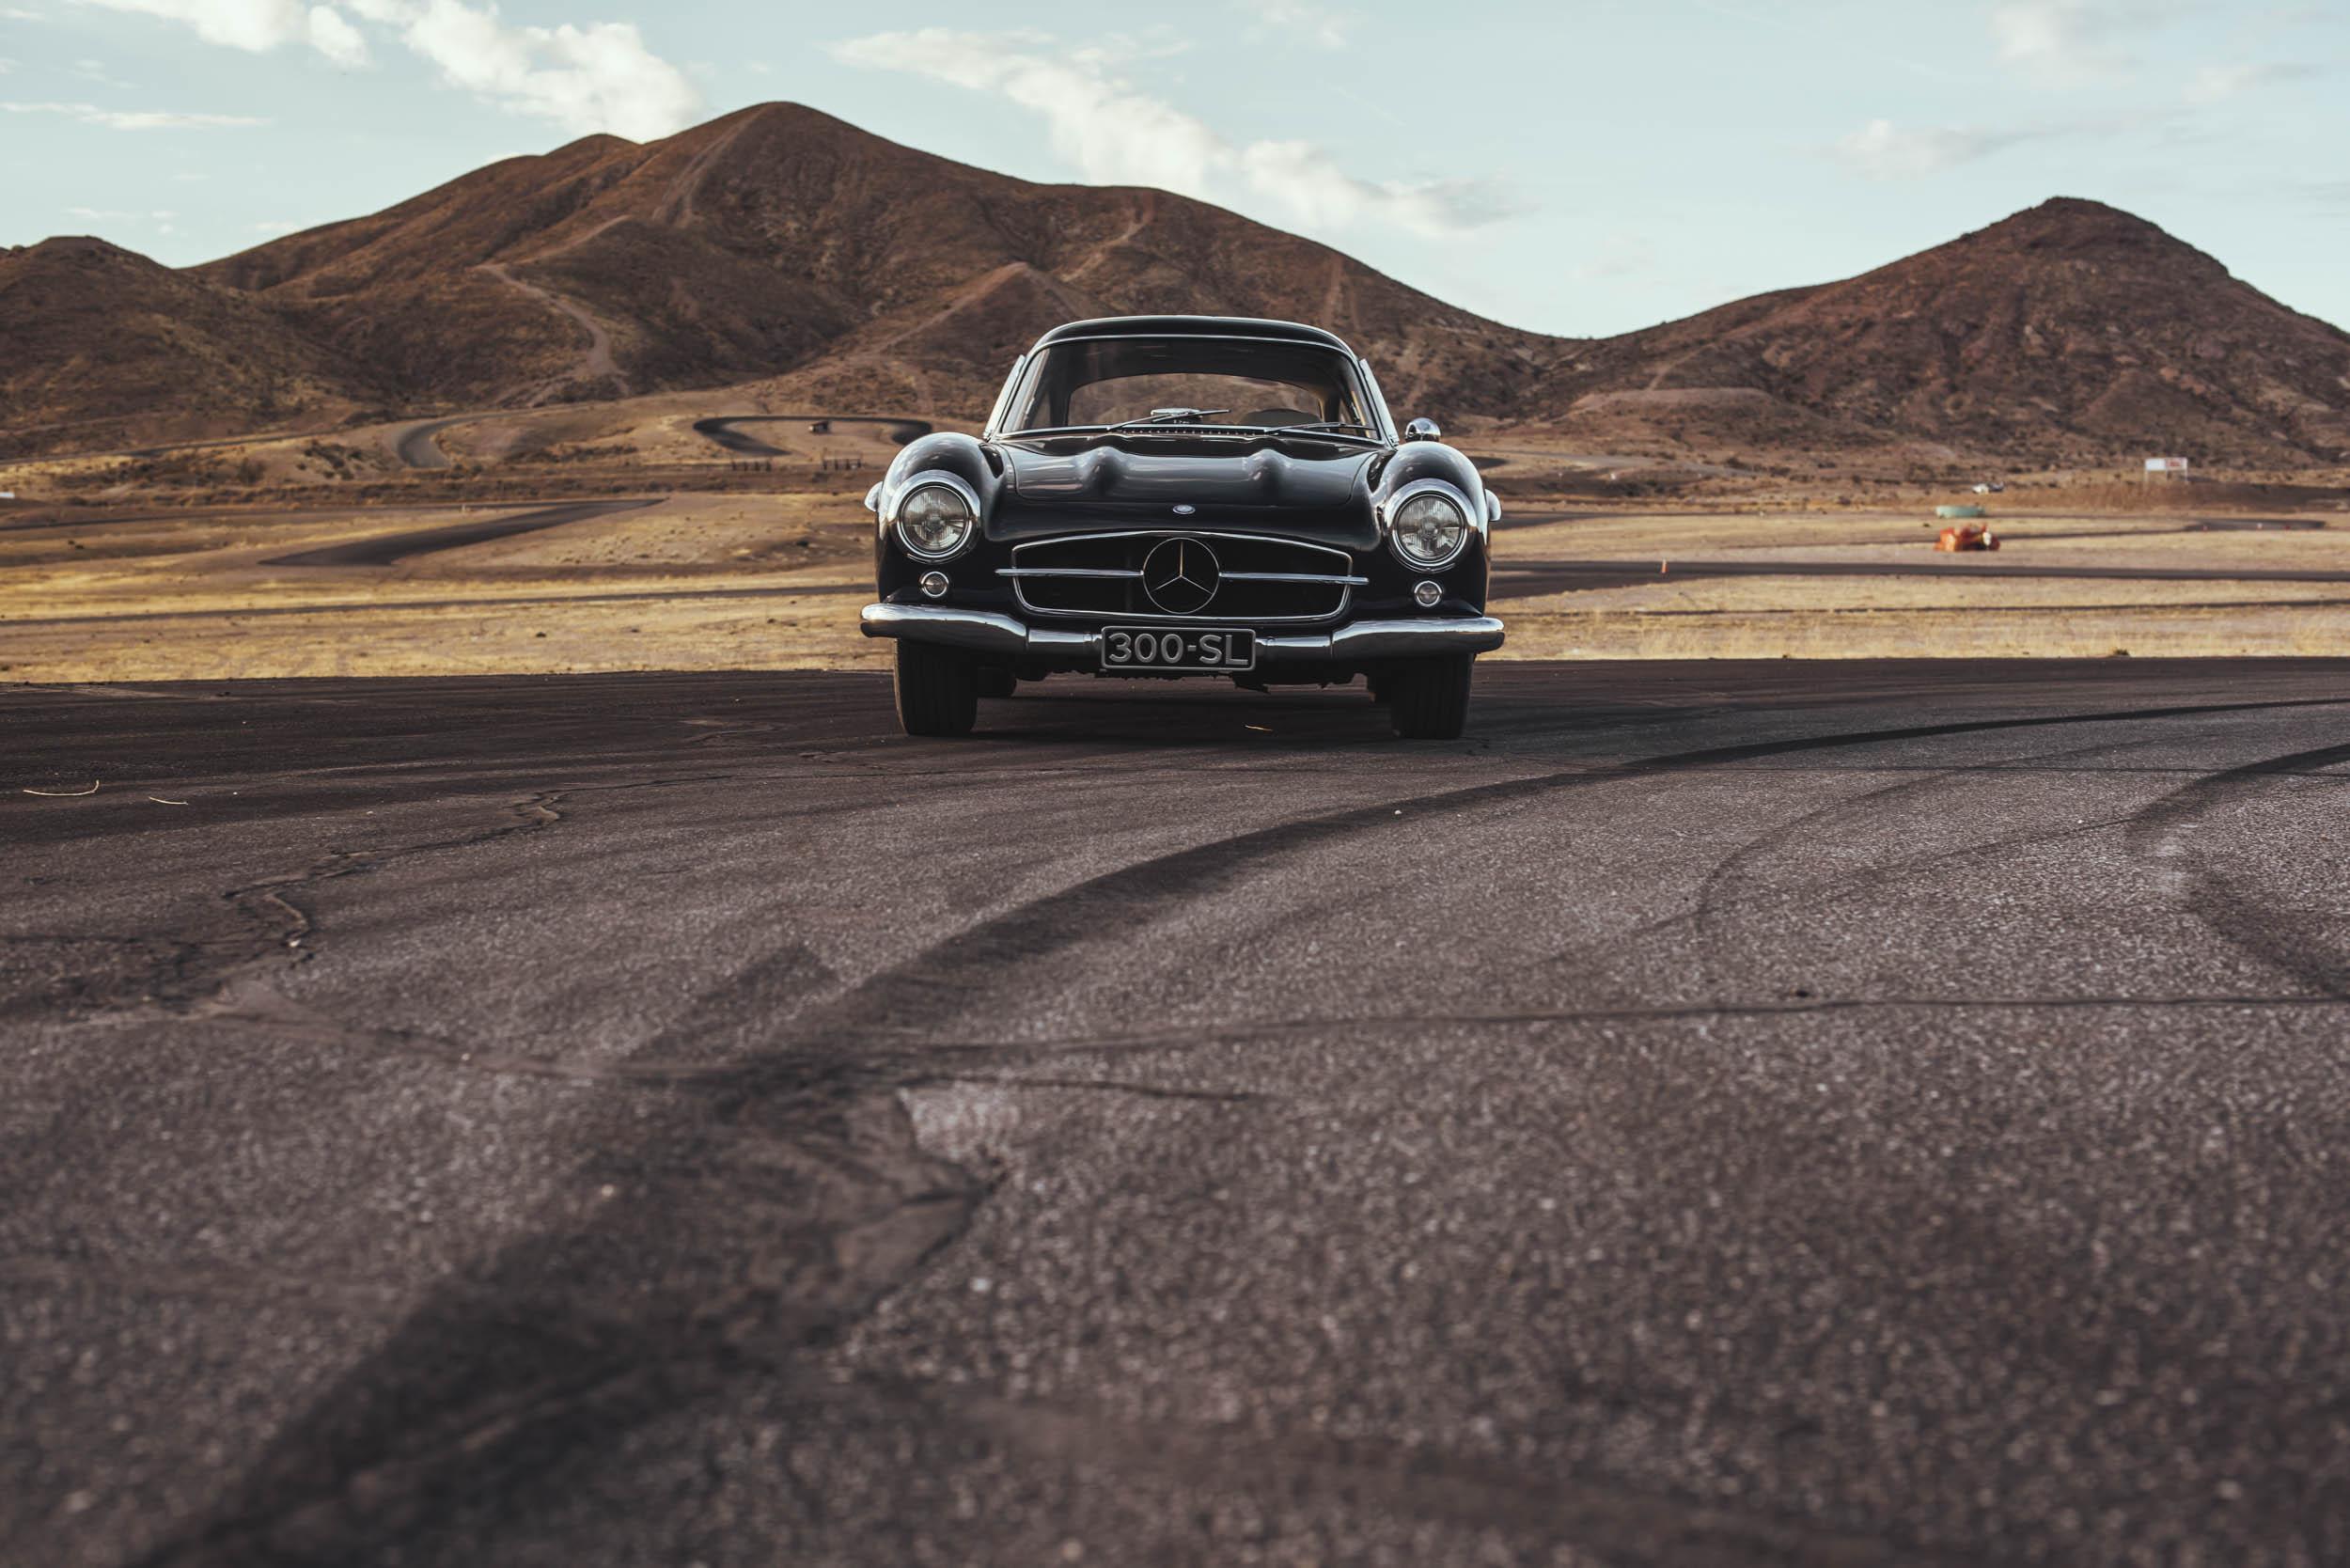 1955 Mercedes-Benz 300 SL Gullwing Sandon Voelker front view